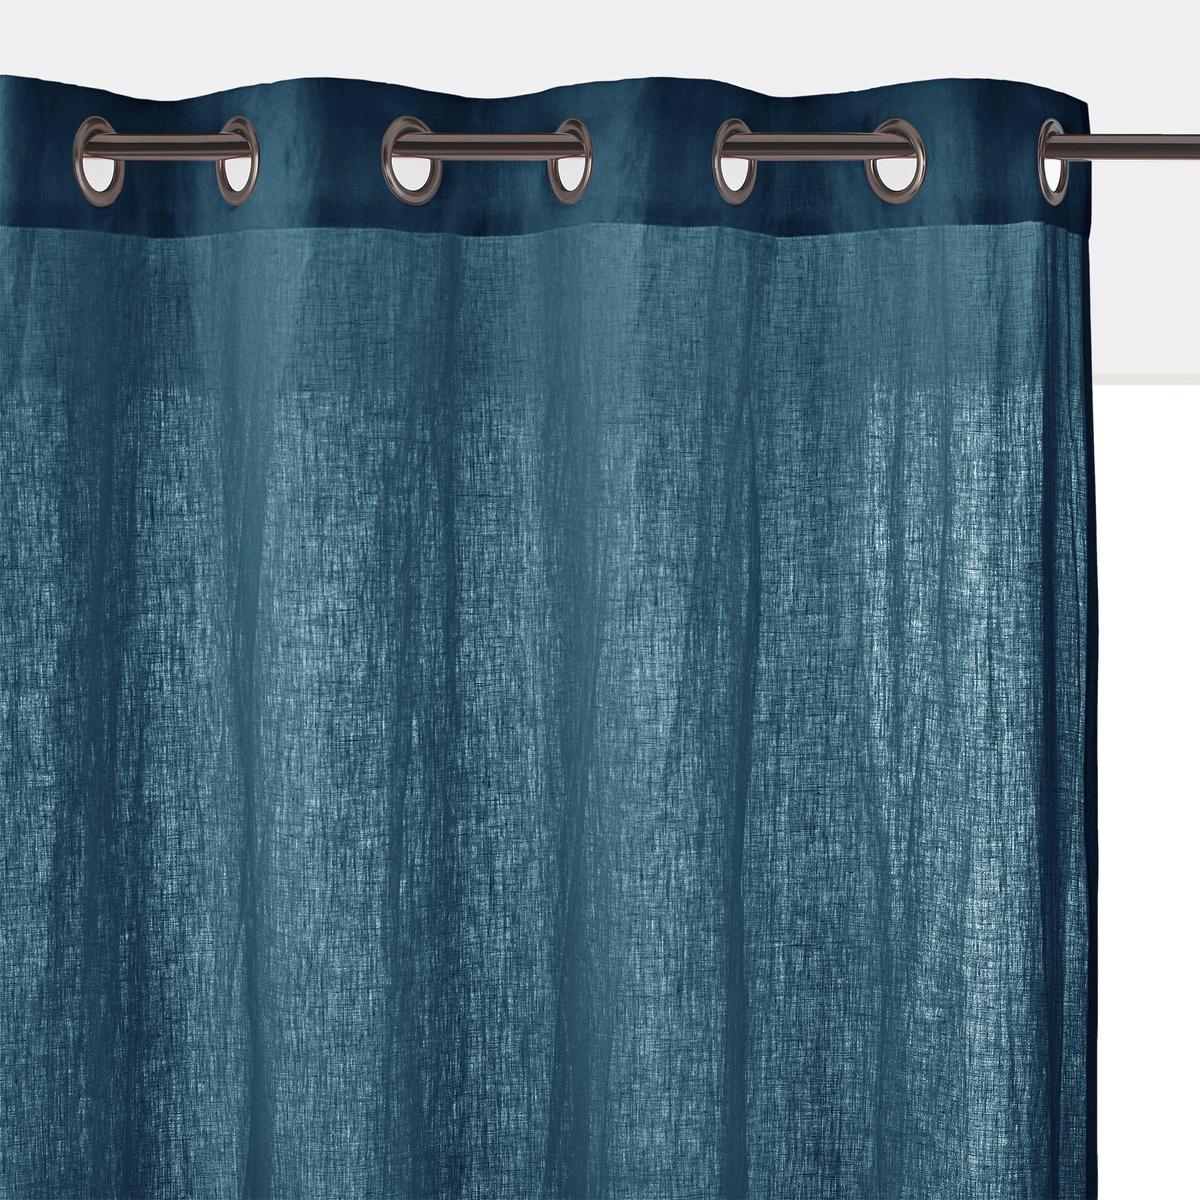 Штора LaRedoute С люверсами из осветленного льна ONEGA 260 x 135 см синий